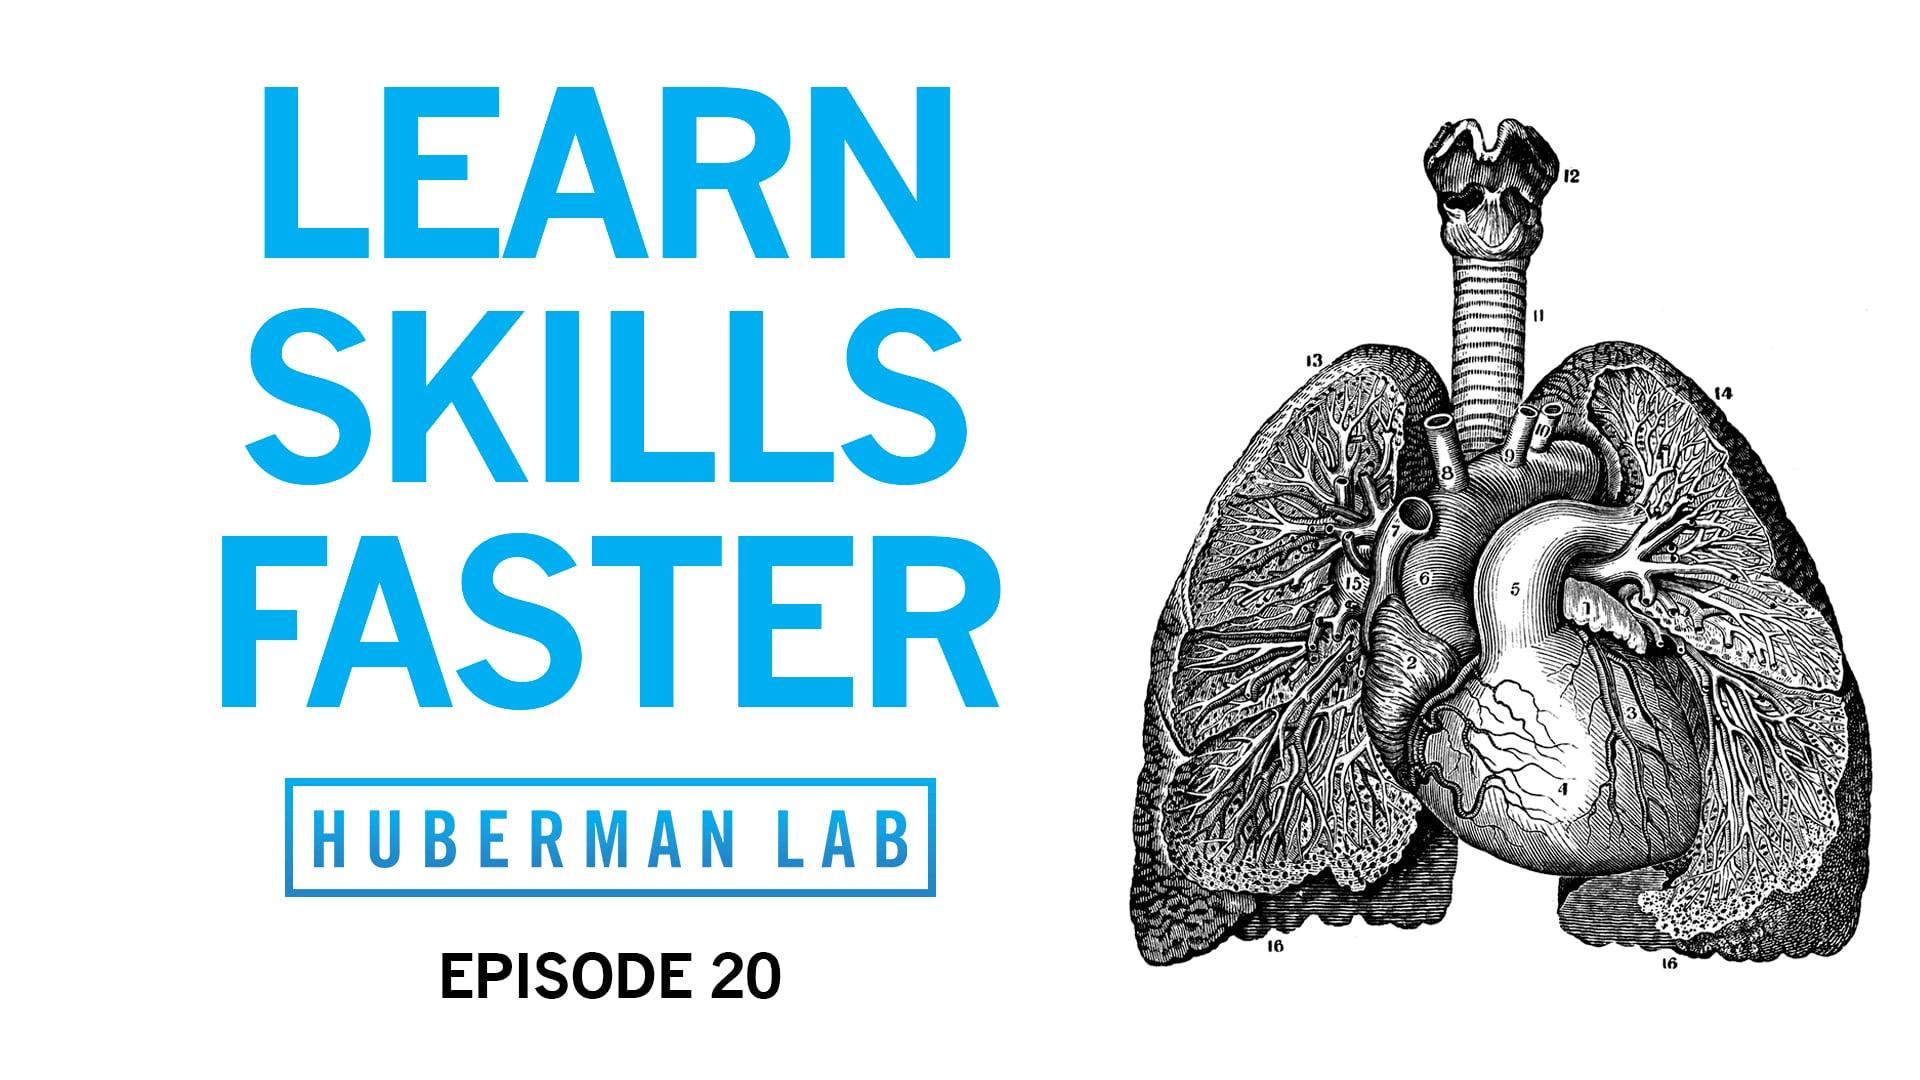 Huberman Lab Podcast Episode 20 Title Card